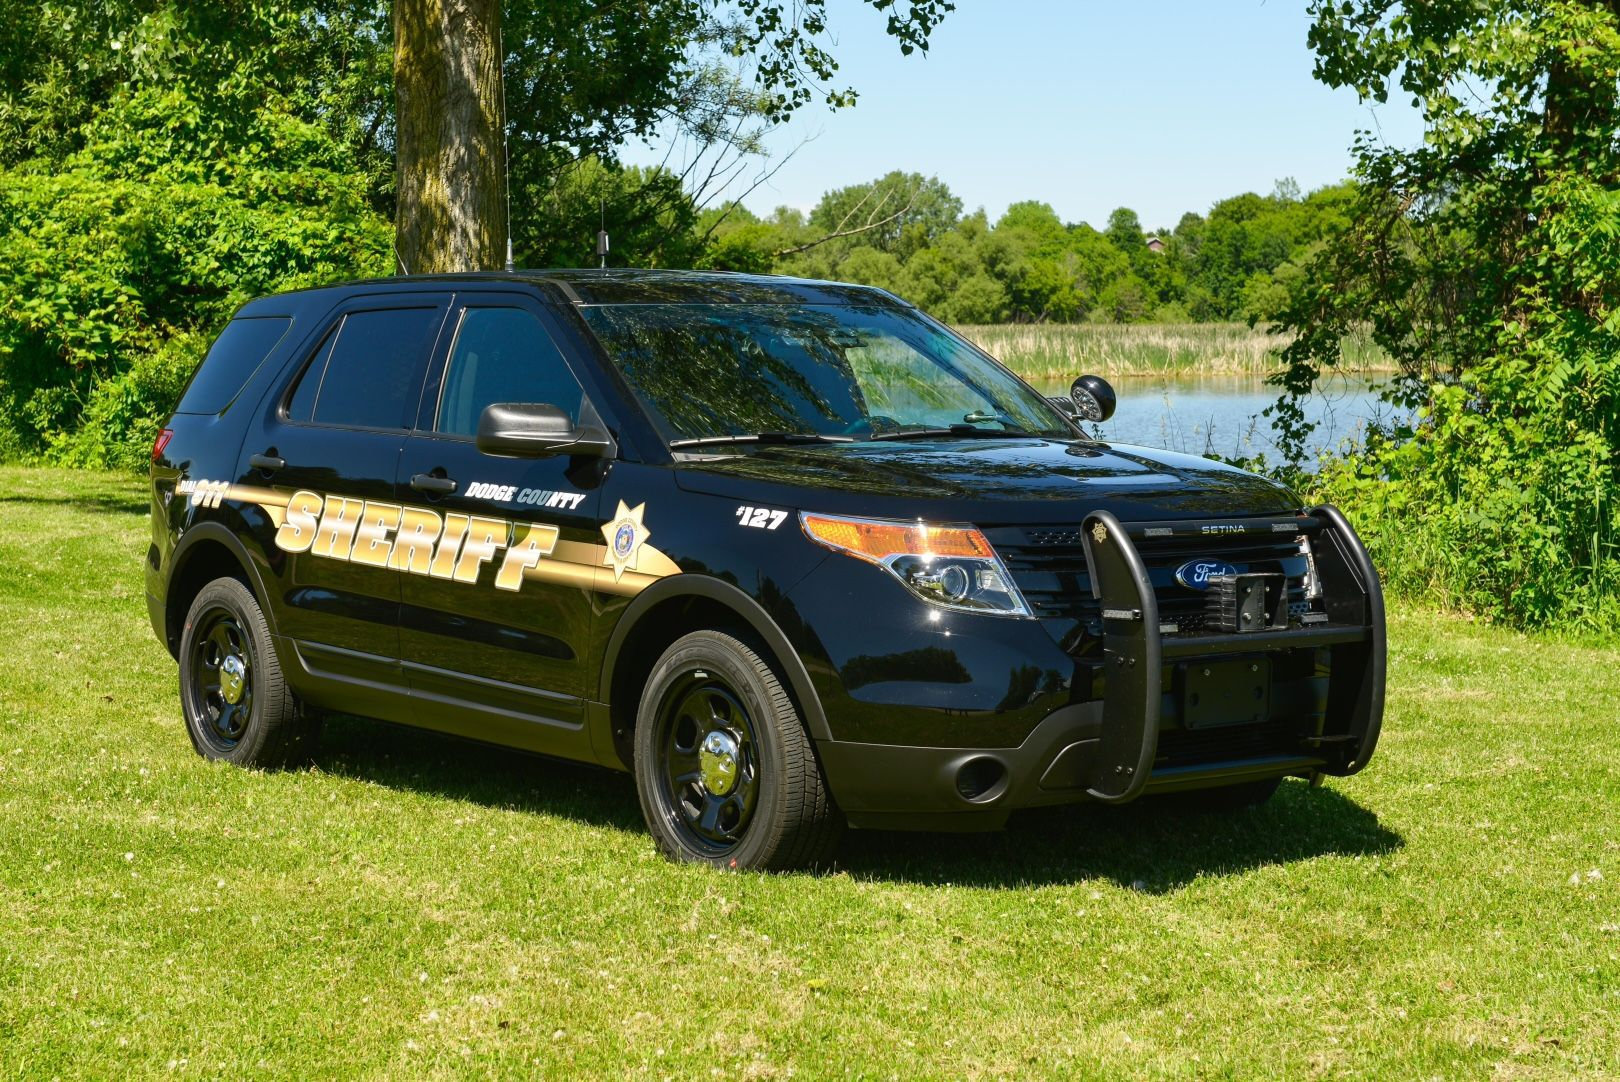 Two children dead, five injured in Dodge County crash